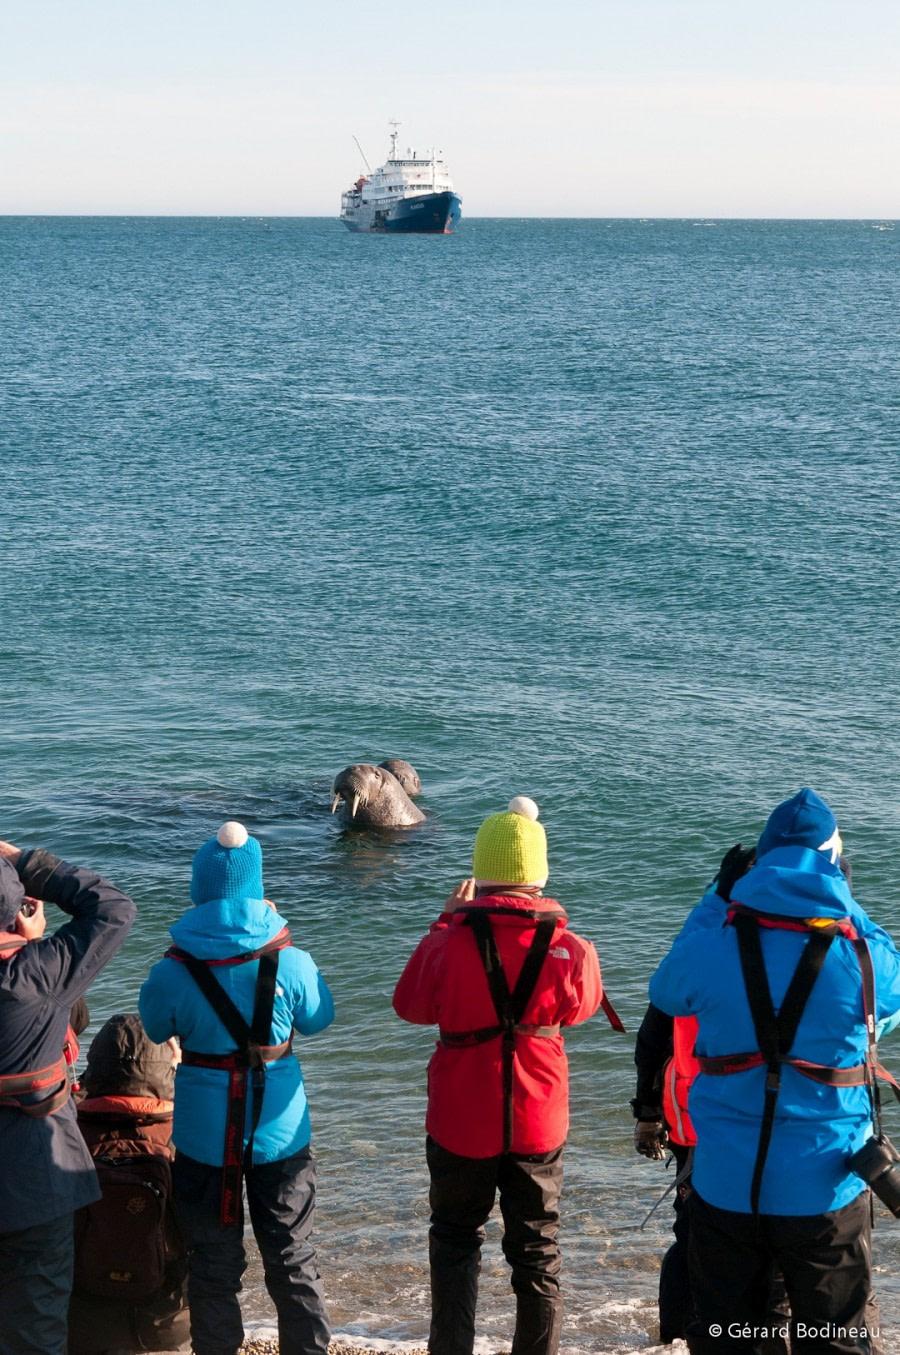 PLA13-18 Day03-05_Torellneset_WalrusAndPlancius_GerardBodineau-Oceanwide Expeditions.jpg